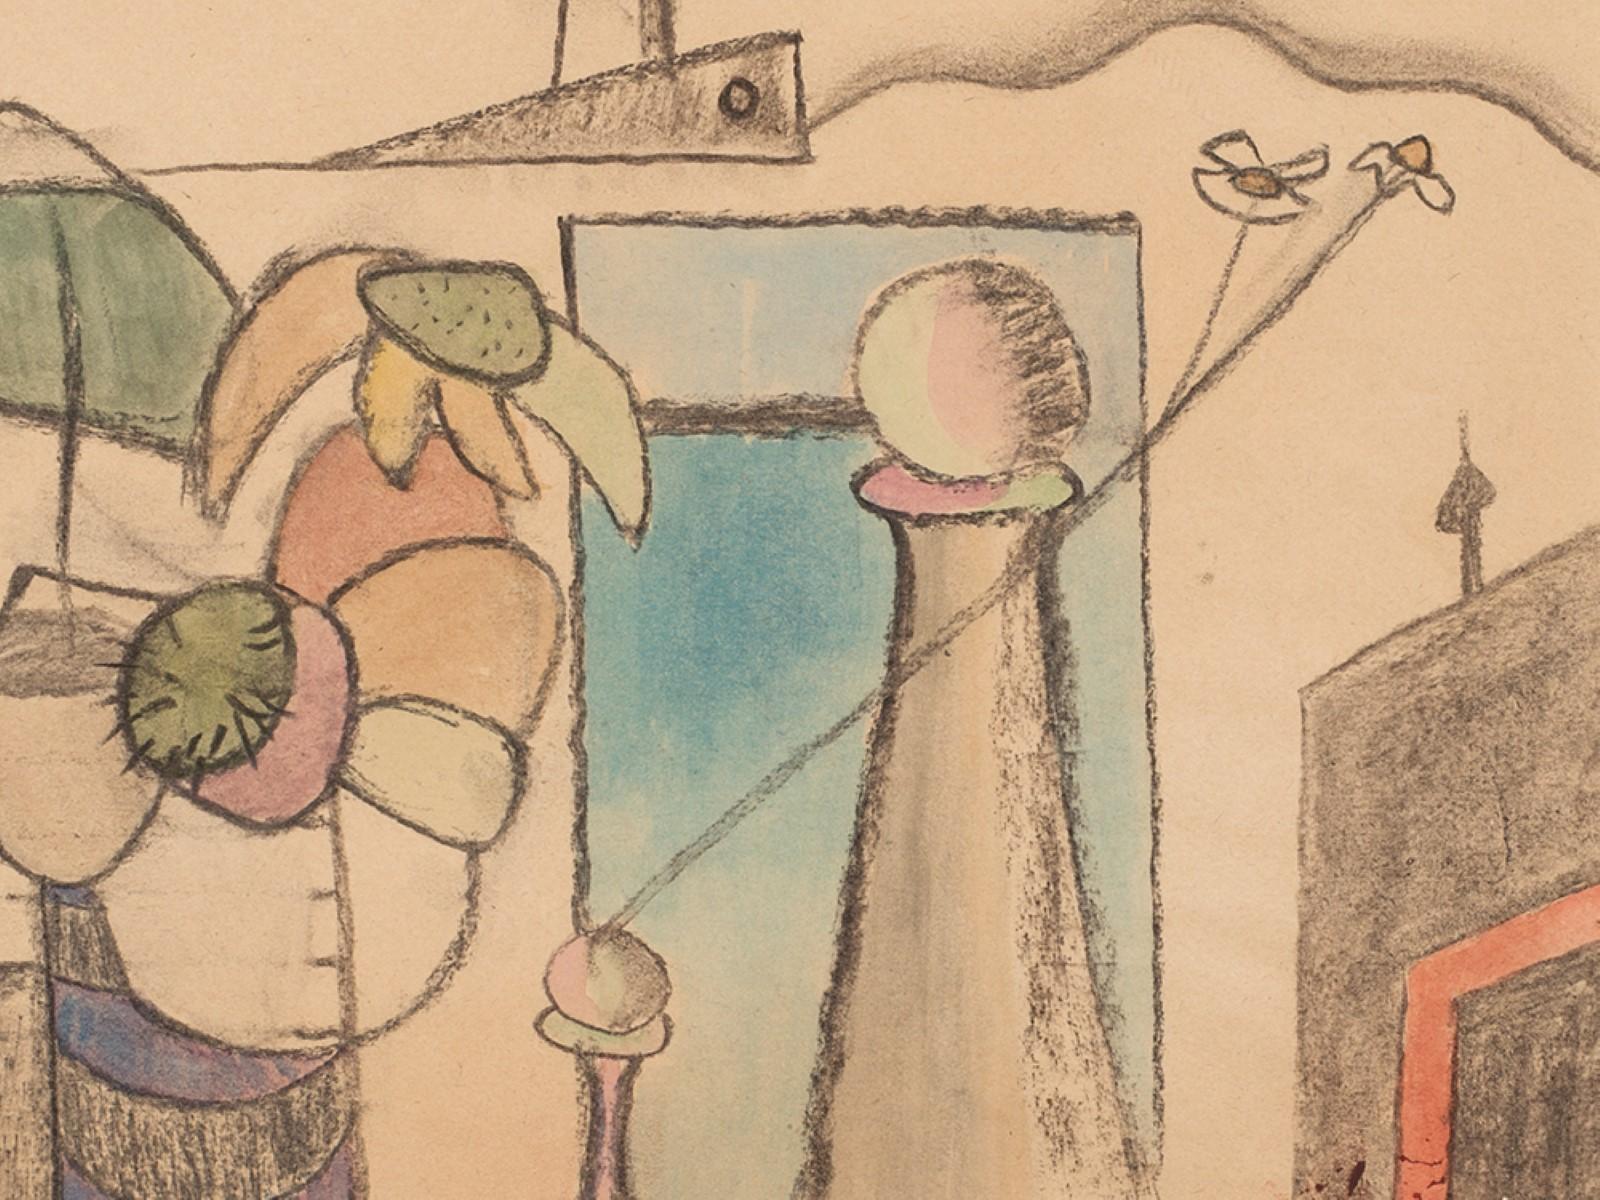 #123 Rudolf Petrik* (1922-1991) Fantasy Landscape, 1950   Rudolf Petrik* (1922-1991), Phantasielandschaft, um 1950 Image